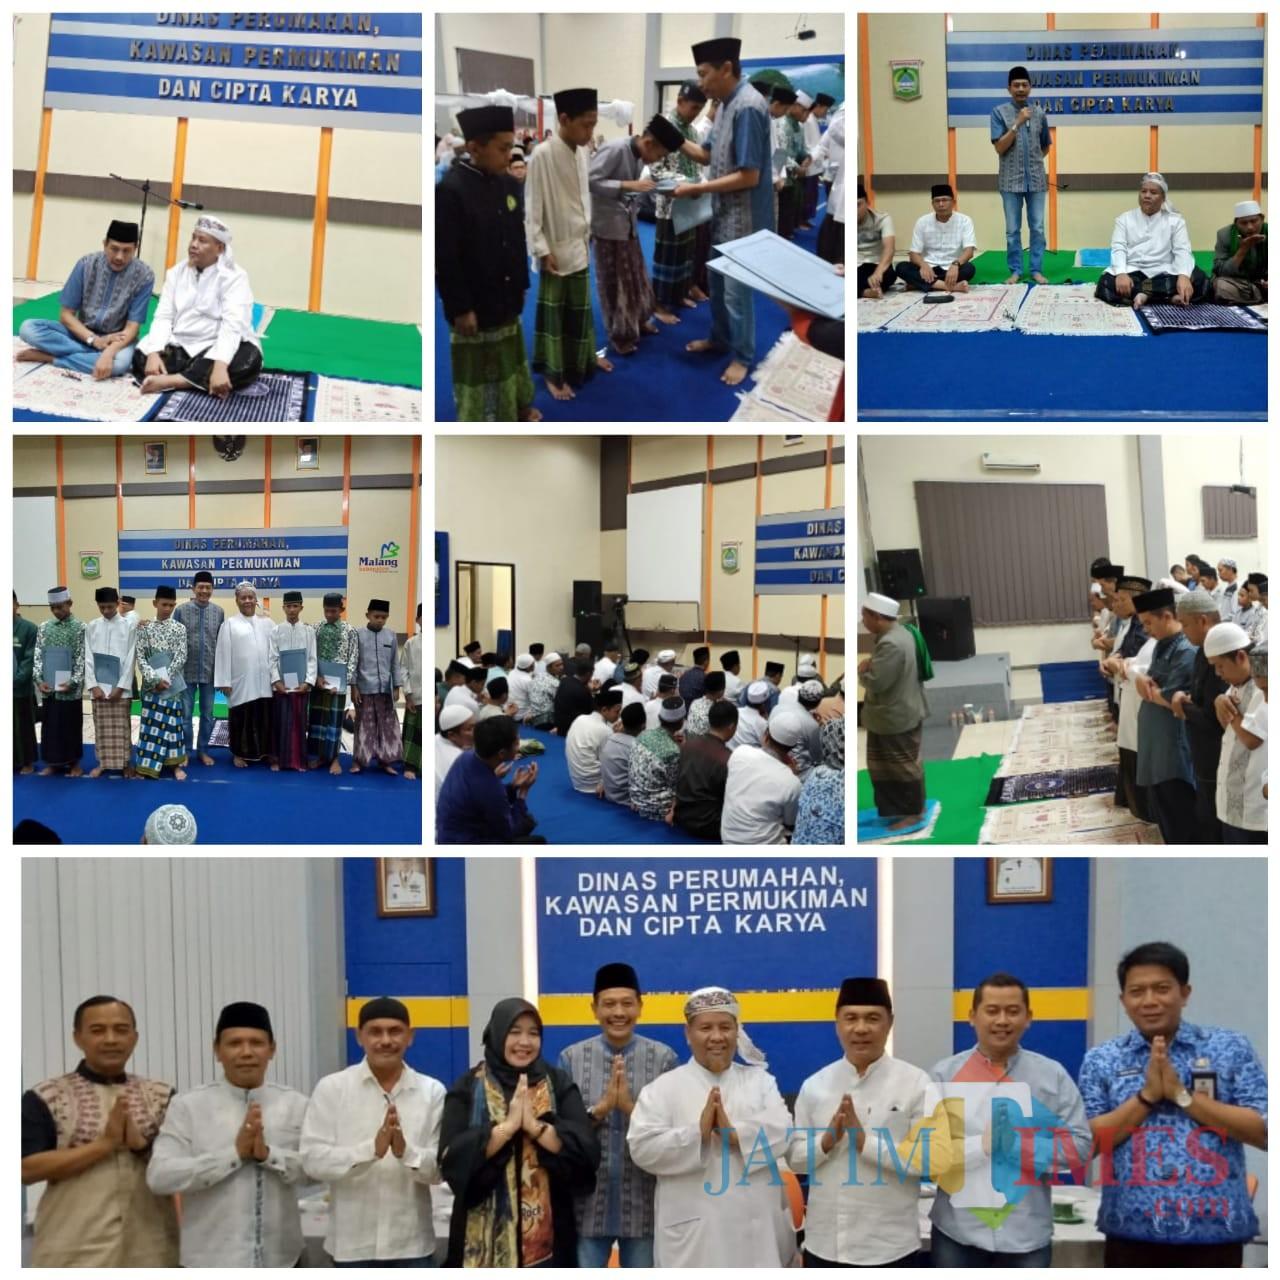 Kolase acara buka bersama dan santunan anak yatim di kantor DPKPCK Kabupaten Malang. (Wahyu for MalangTIMES)